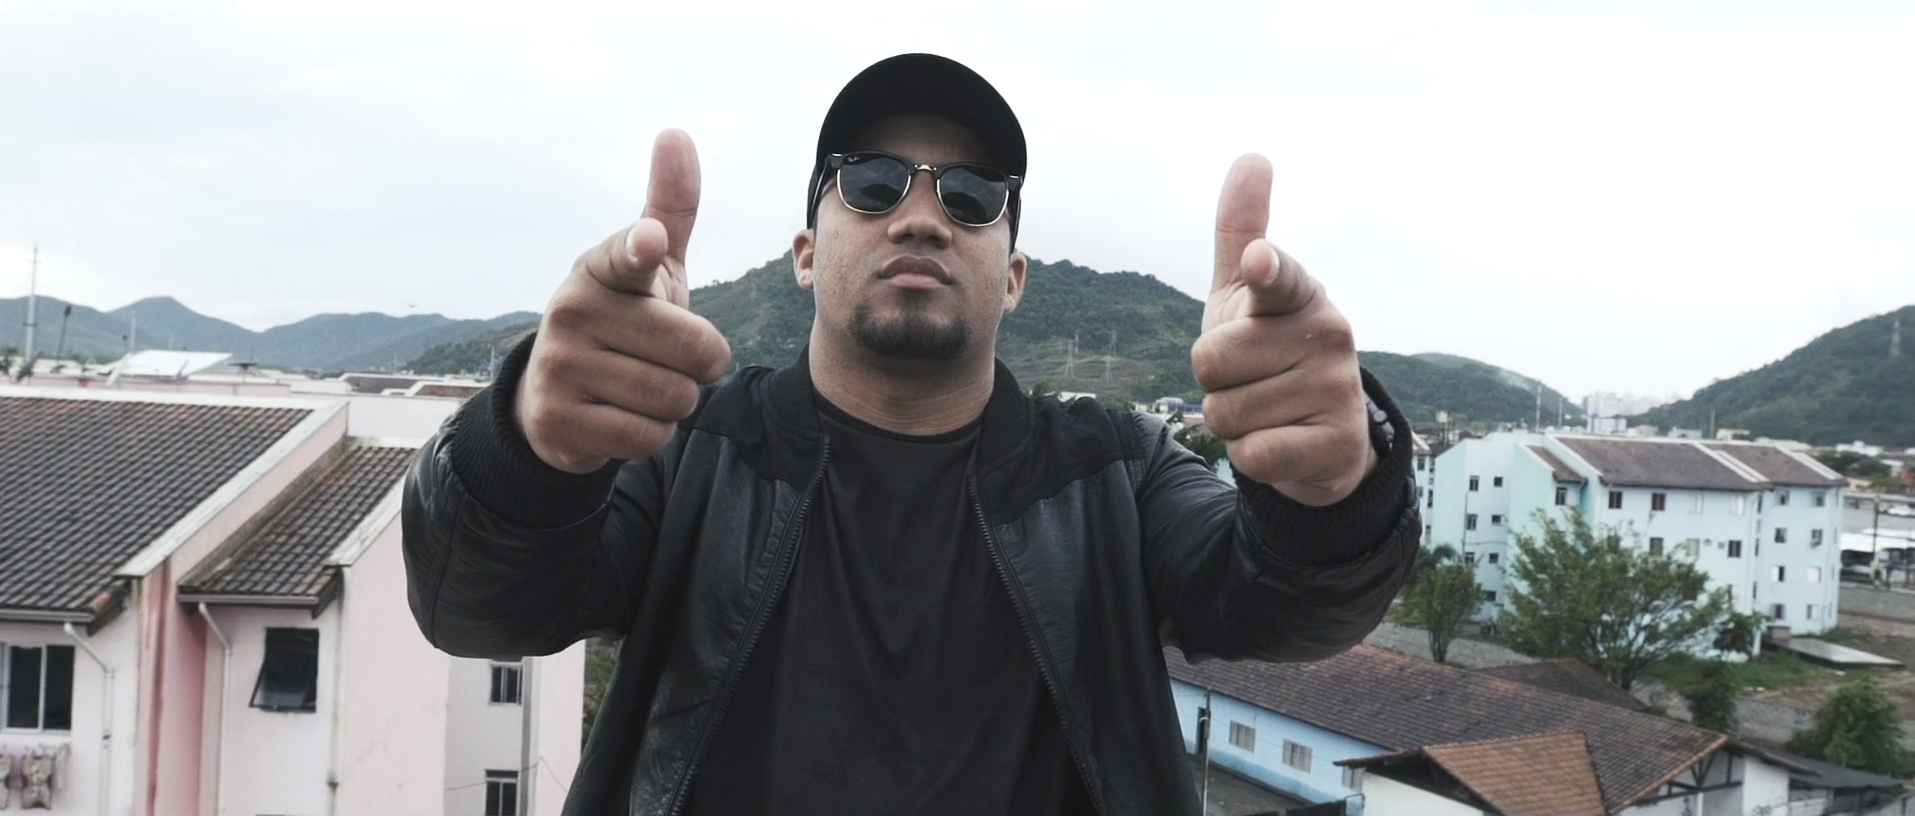 KondZilla: YouTube Star's Net Worth, Songs List And Viral Hit Bum